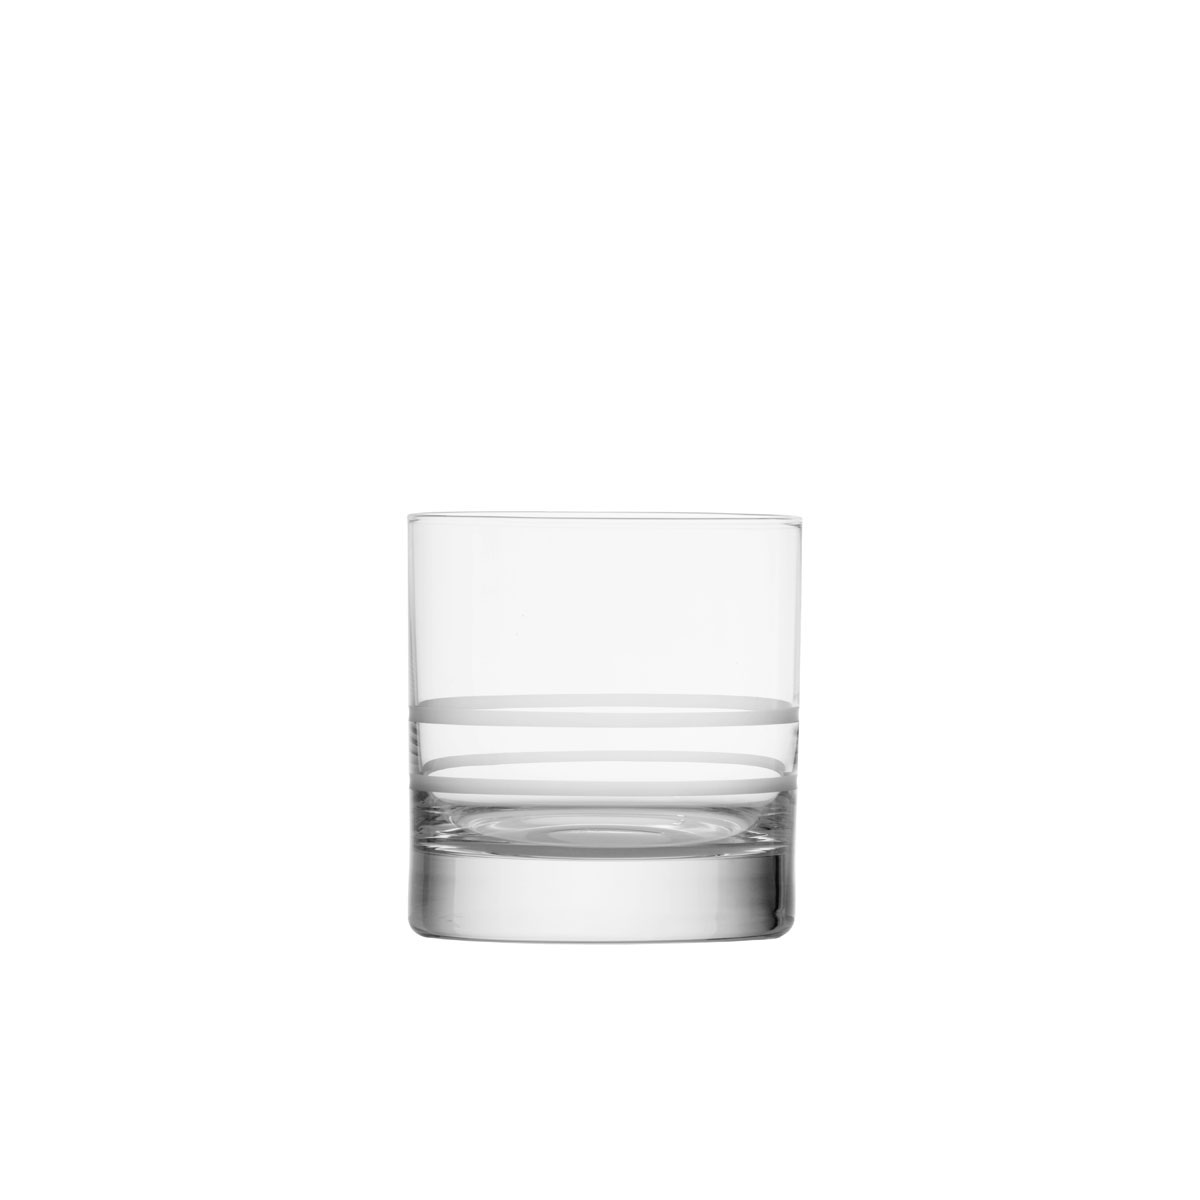 Schott Zwiesel Tritan Crystal, Crafthouse Iceberg Crystal DOF Tumbler, Single